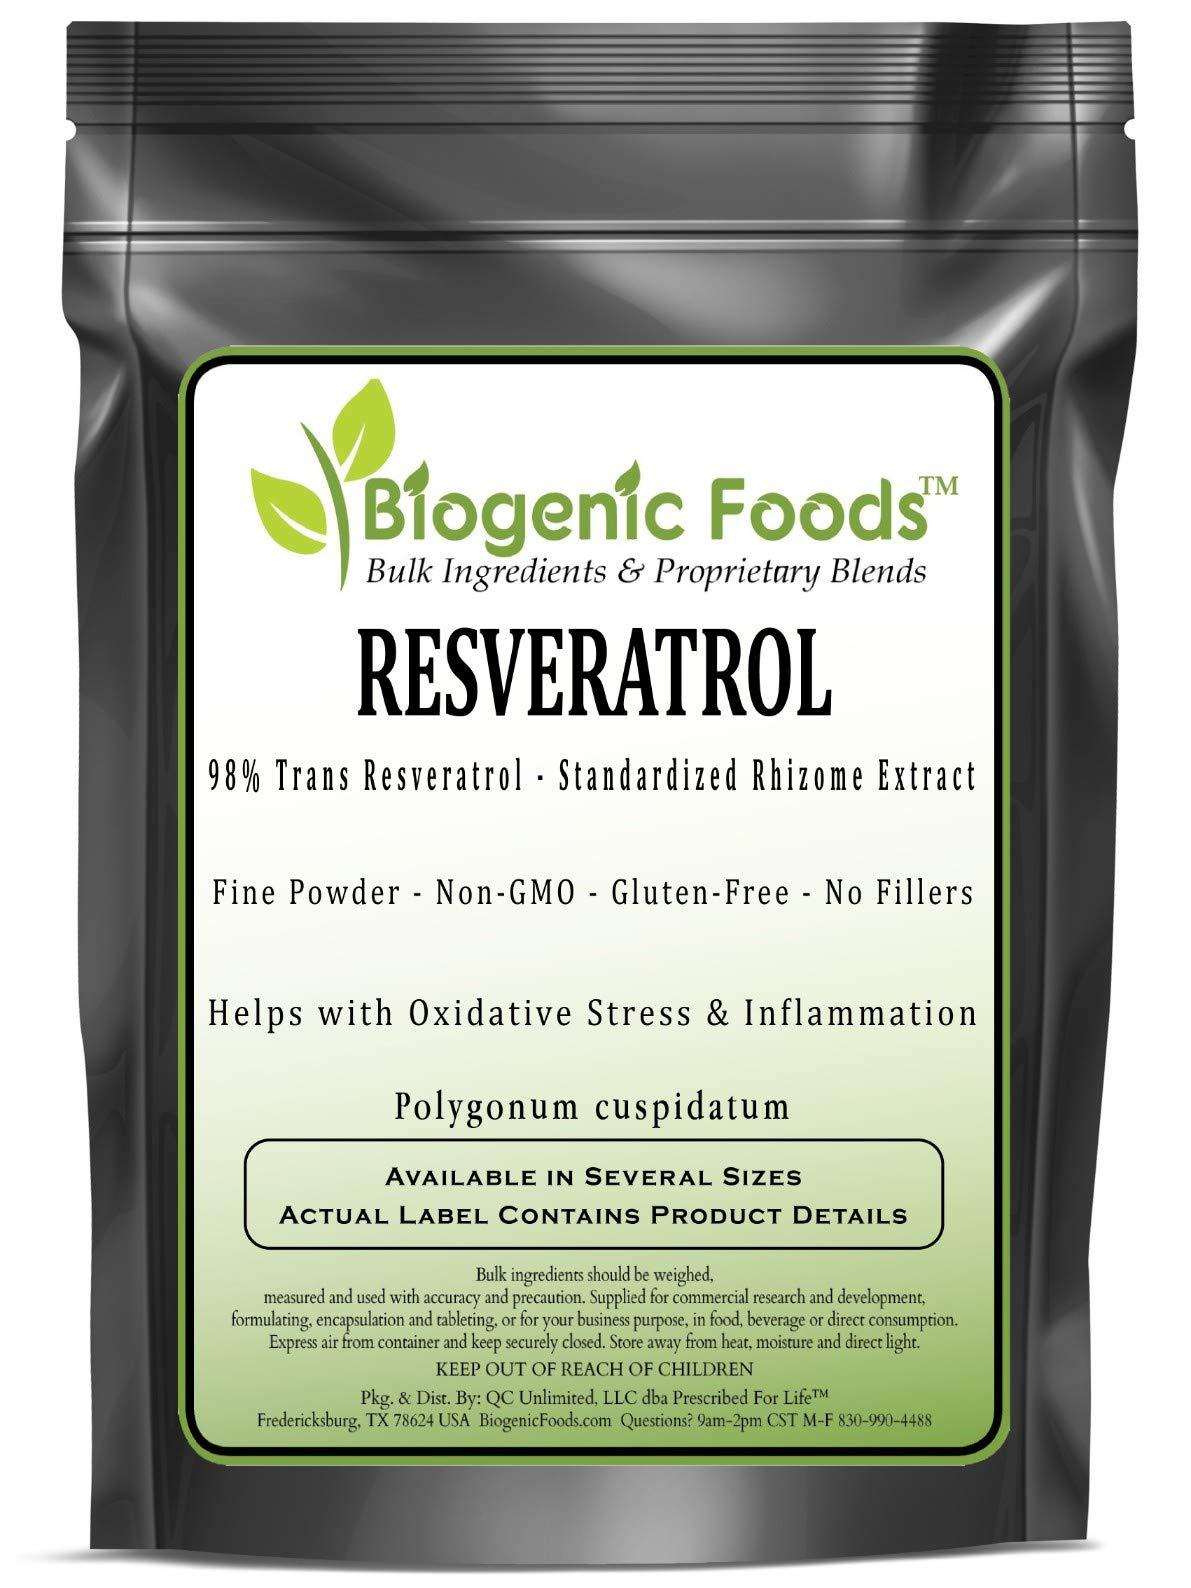 Resveratrol - 98% Trans Resveratrol - Standardized Rhizome Fine Powder Extract (Polygonum cuspidatum), 1 kg